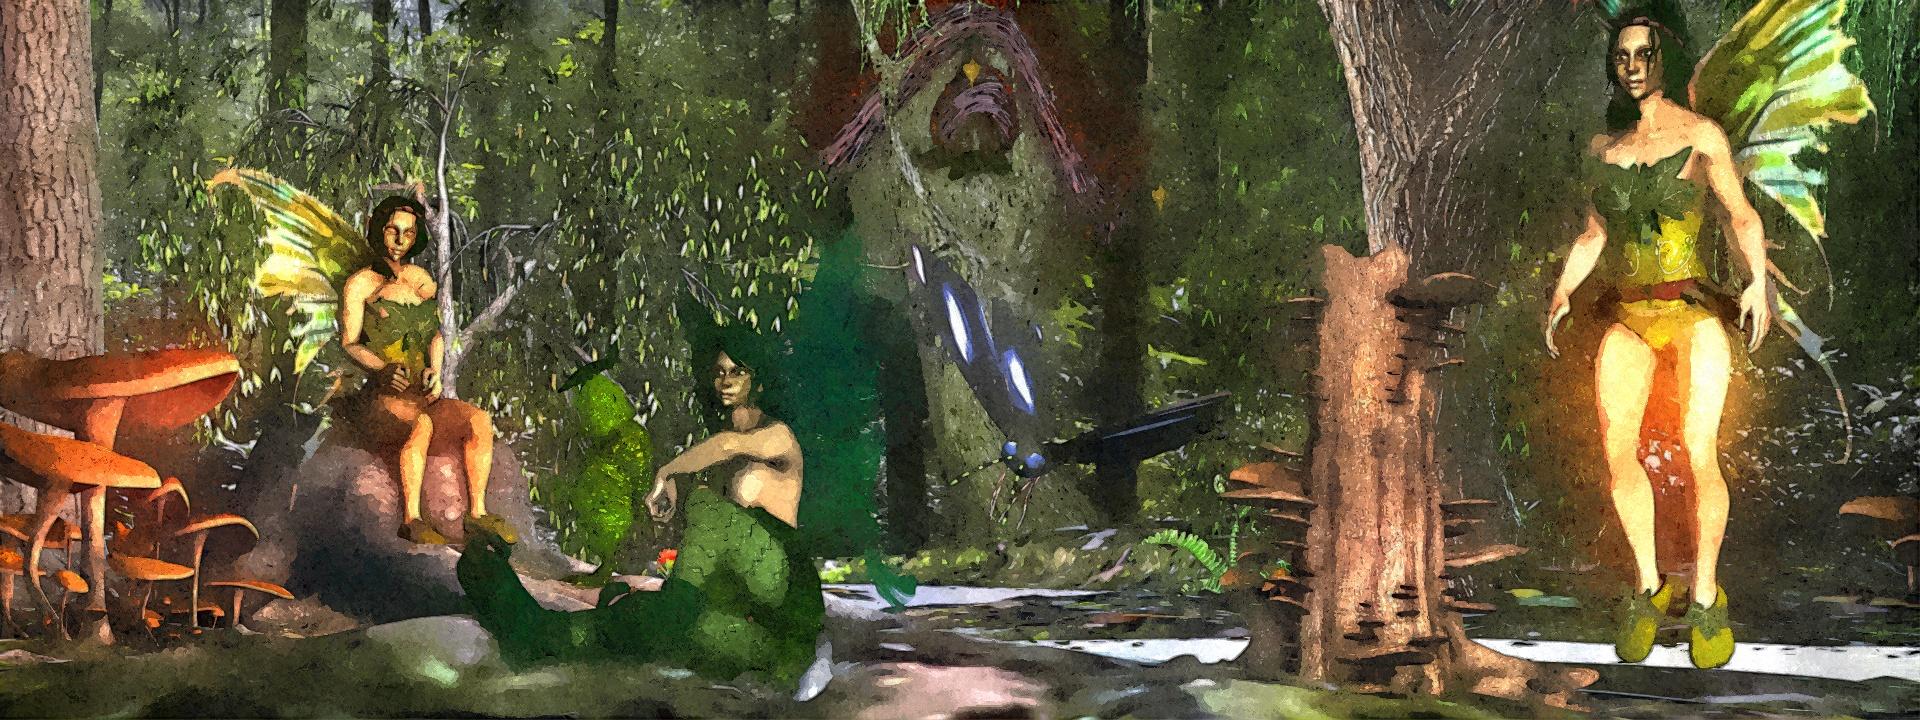 https://forum.reallusion.com/uploads/images/063ef201-7ead-4f32-bb55-b825.jpg